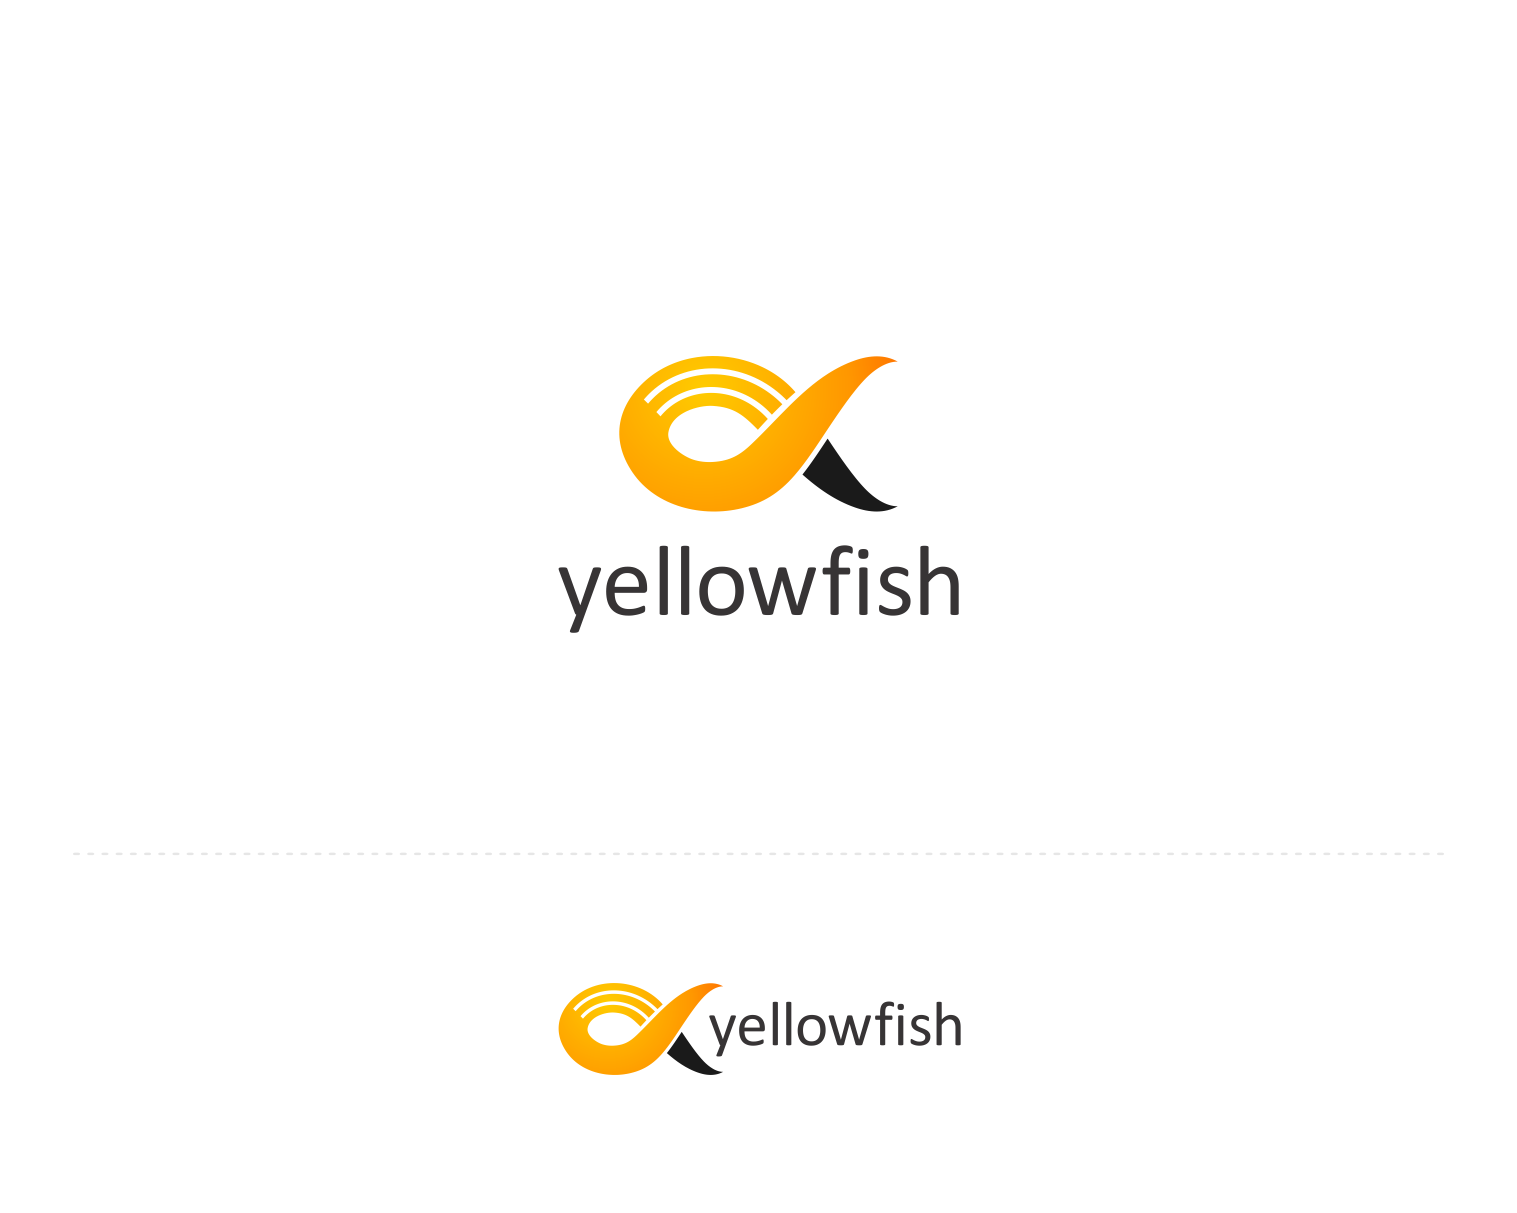 New logo wanted for Yellowfish